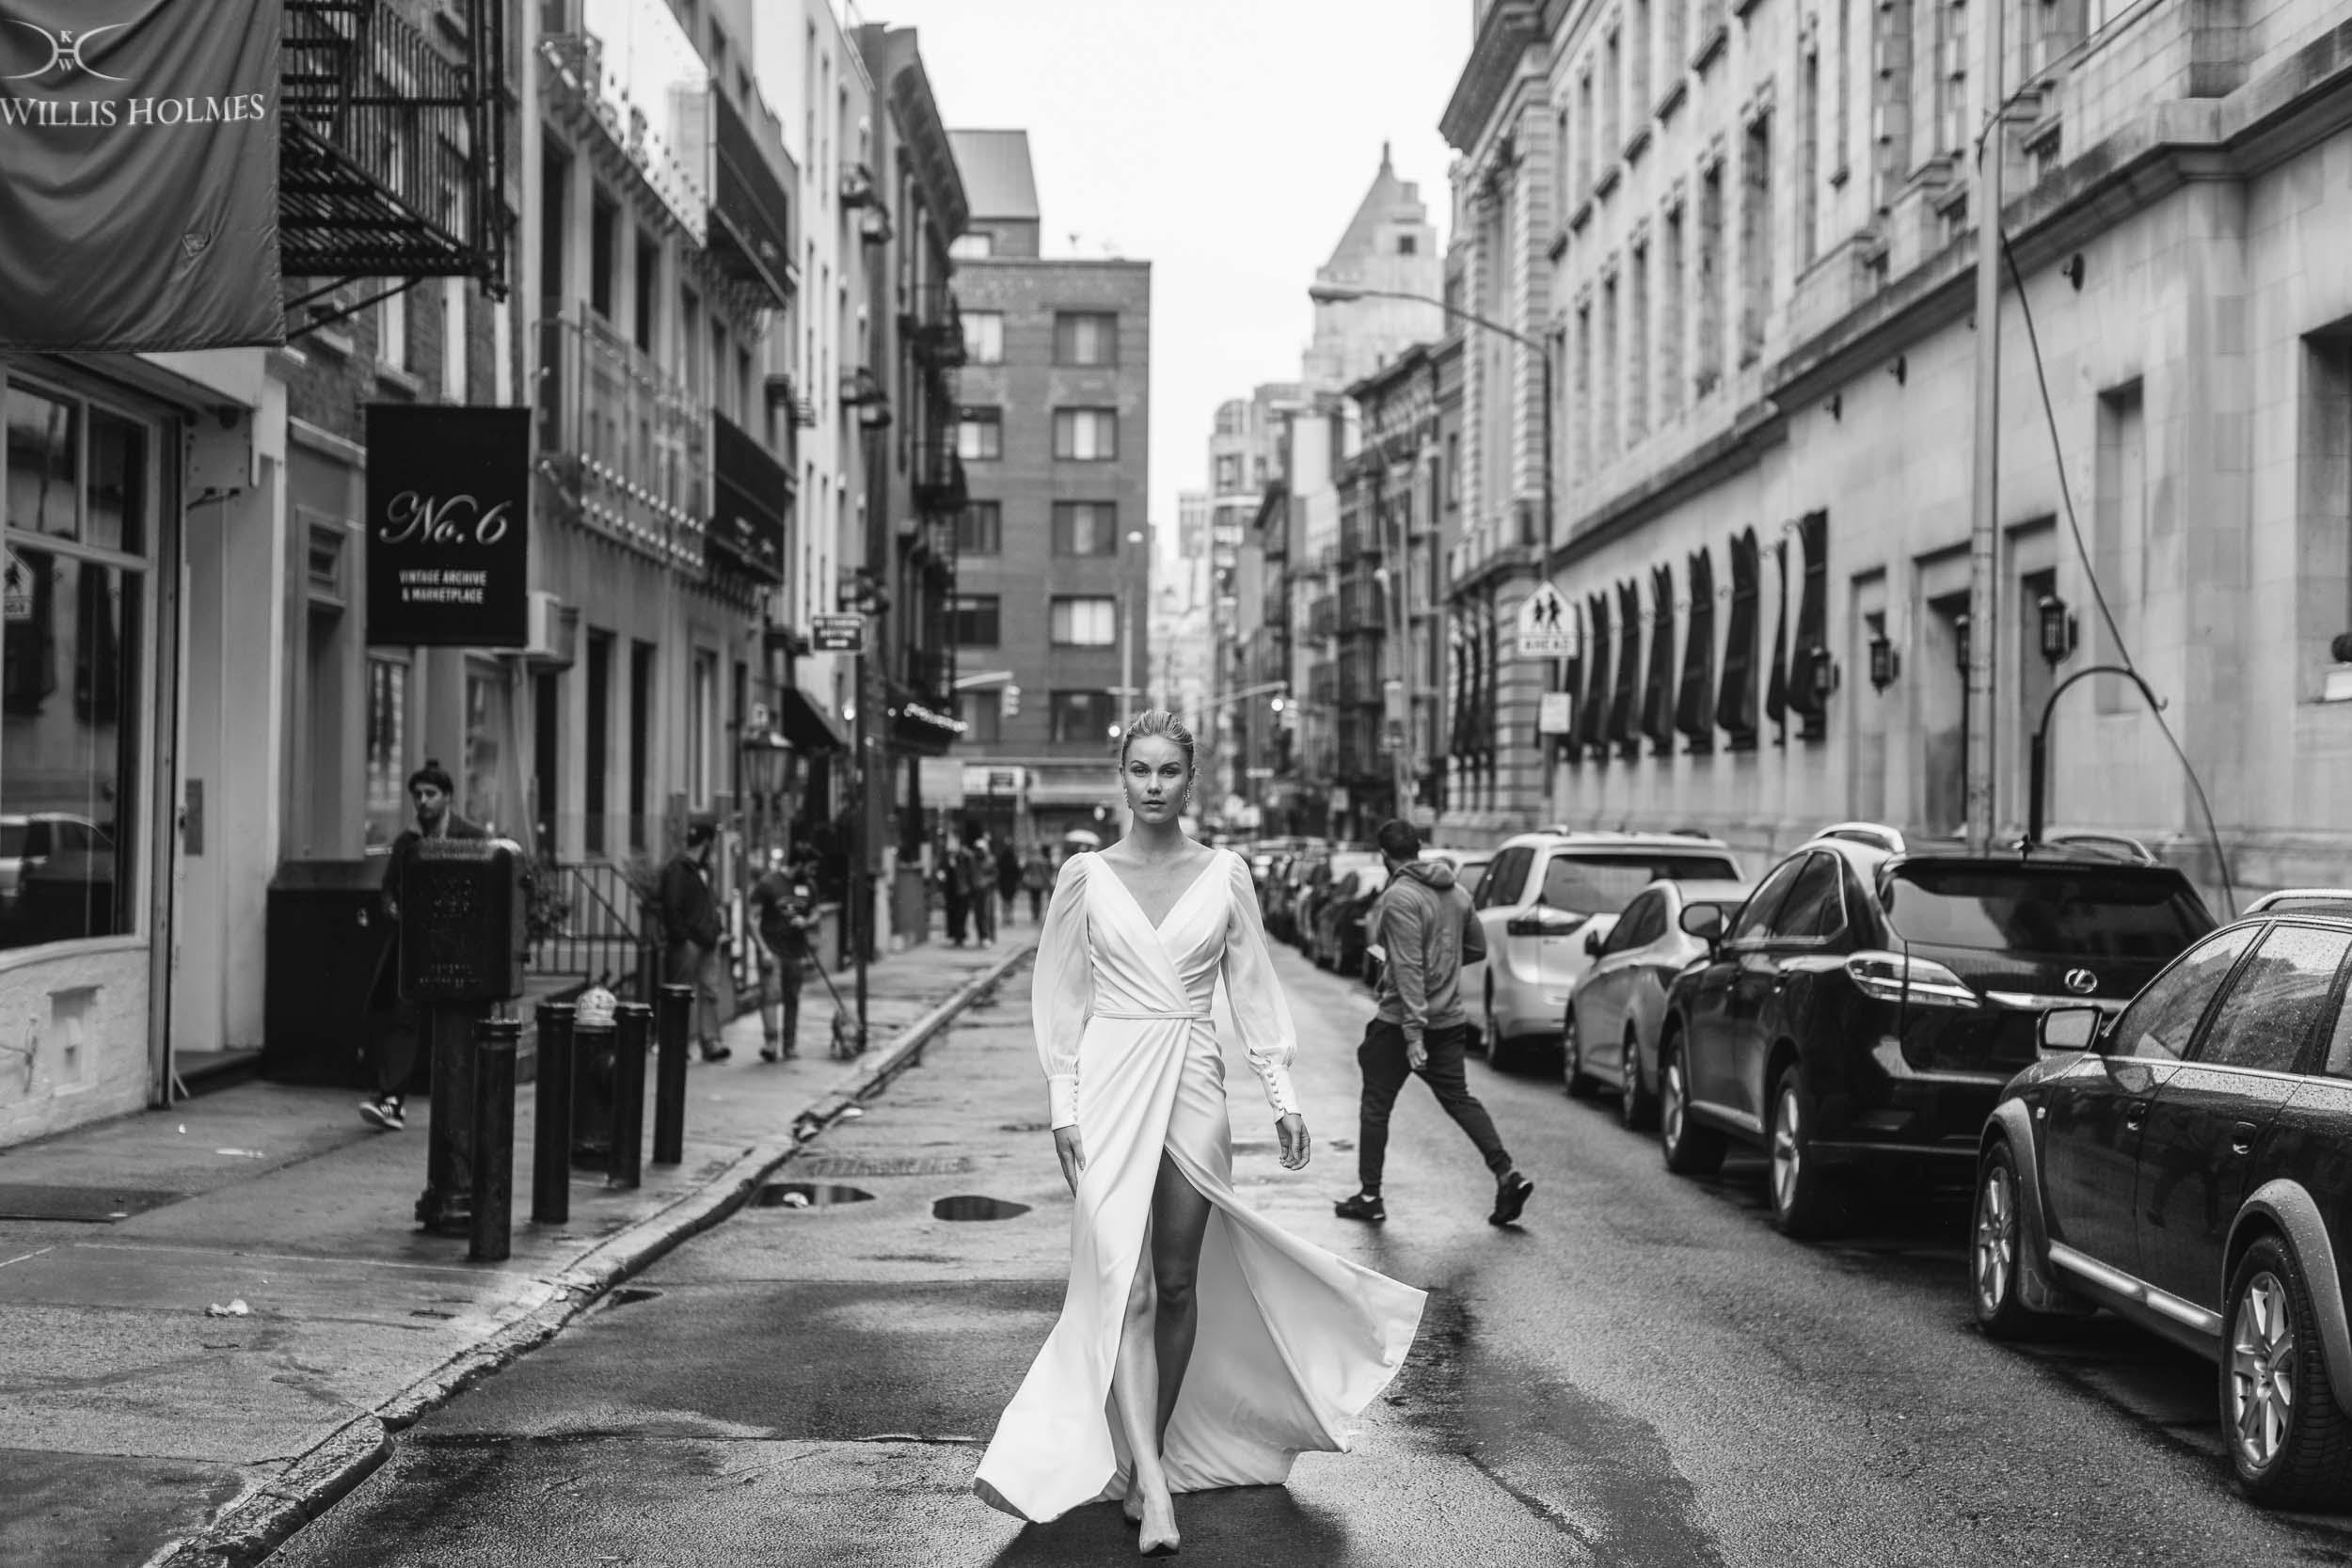 Kas-Richards-New-York-City-Wedding-Karen-Willis_Holmes-114.jpg